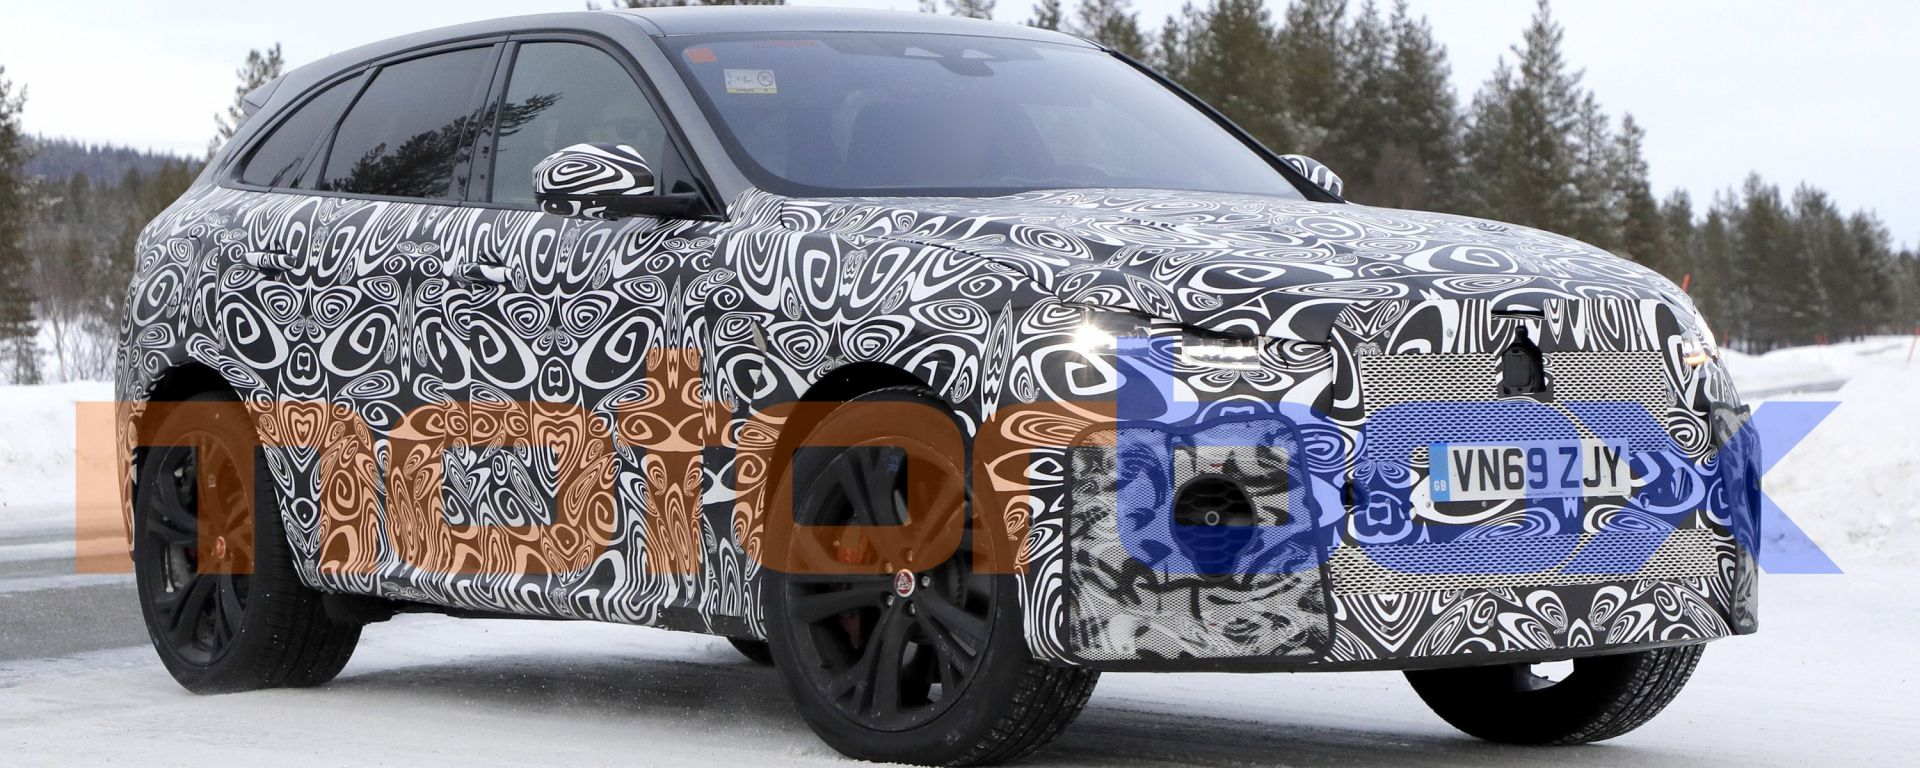 Nuova Jaguar F-Pace: il SUV inglese nel 2021